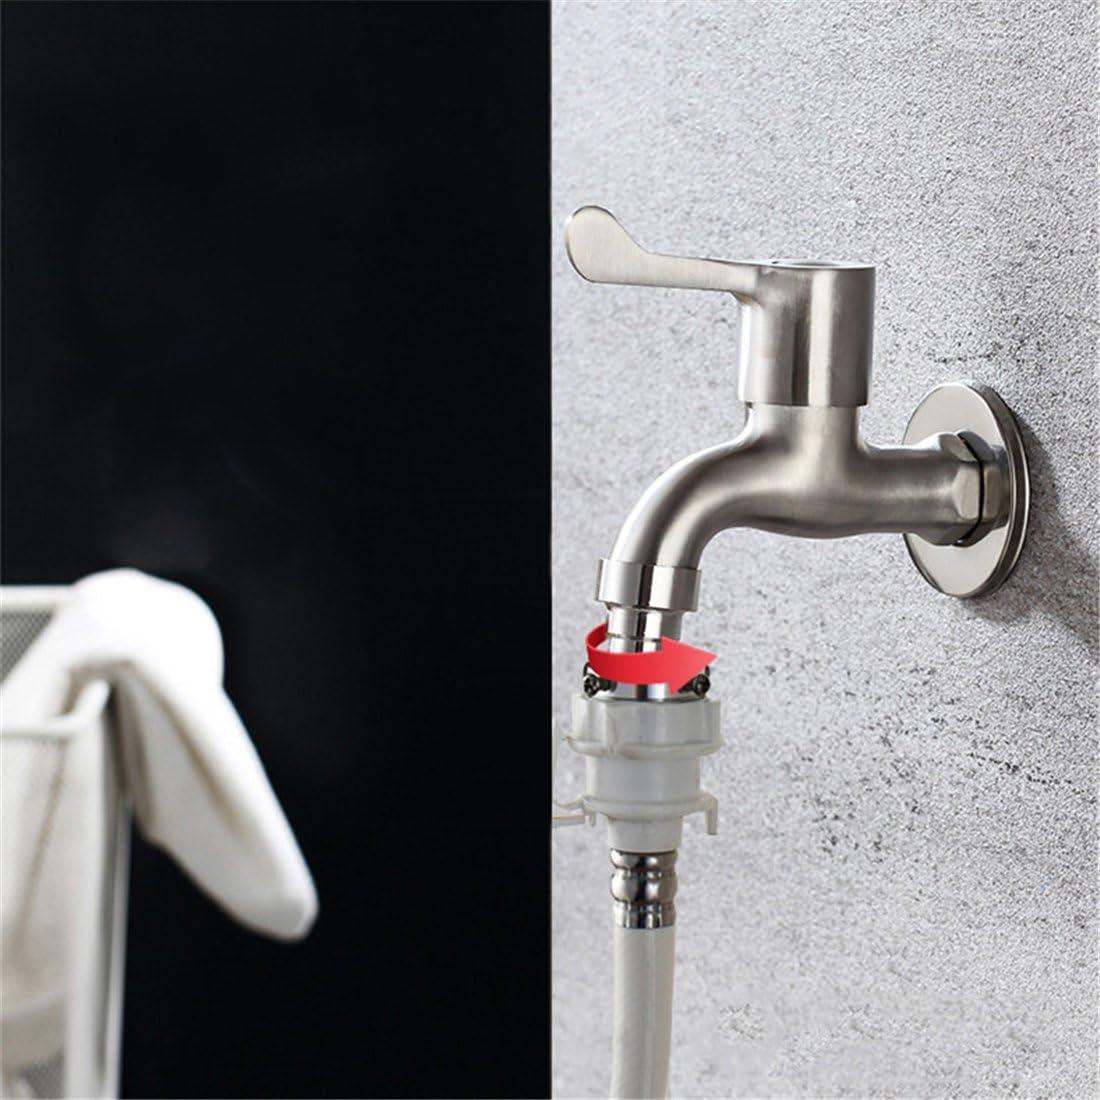 Zirtaps Simple Lavadora De Acero Inoxidable Faucet Balcón Grifo ...